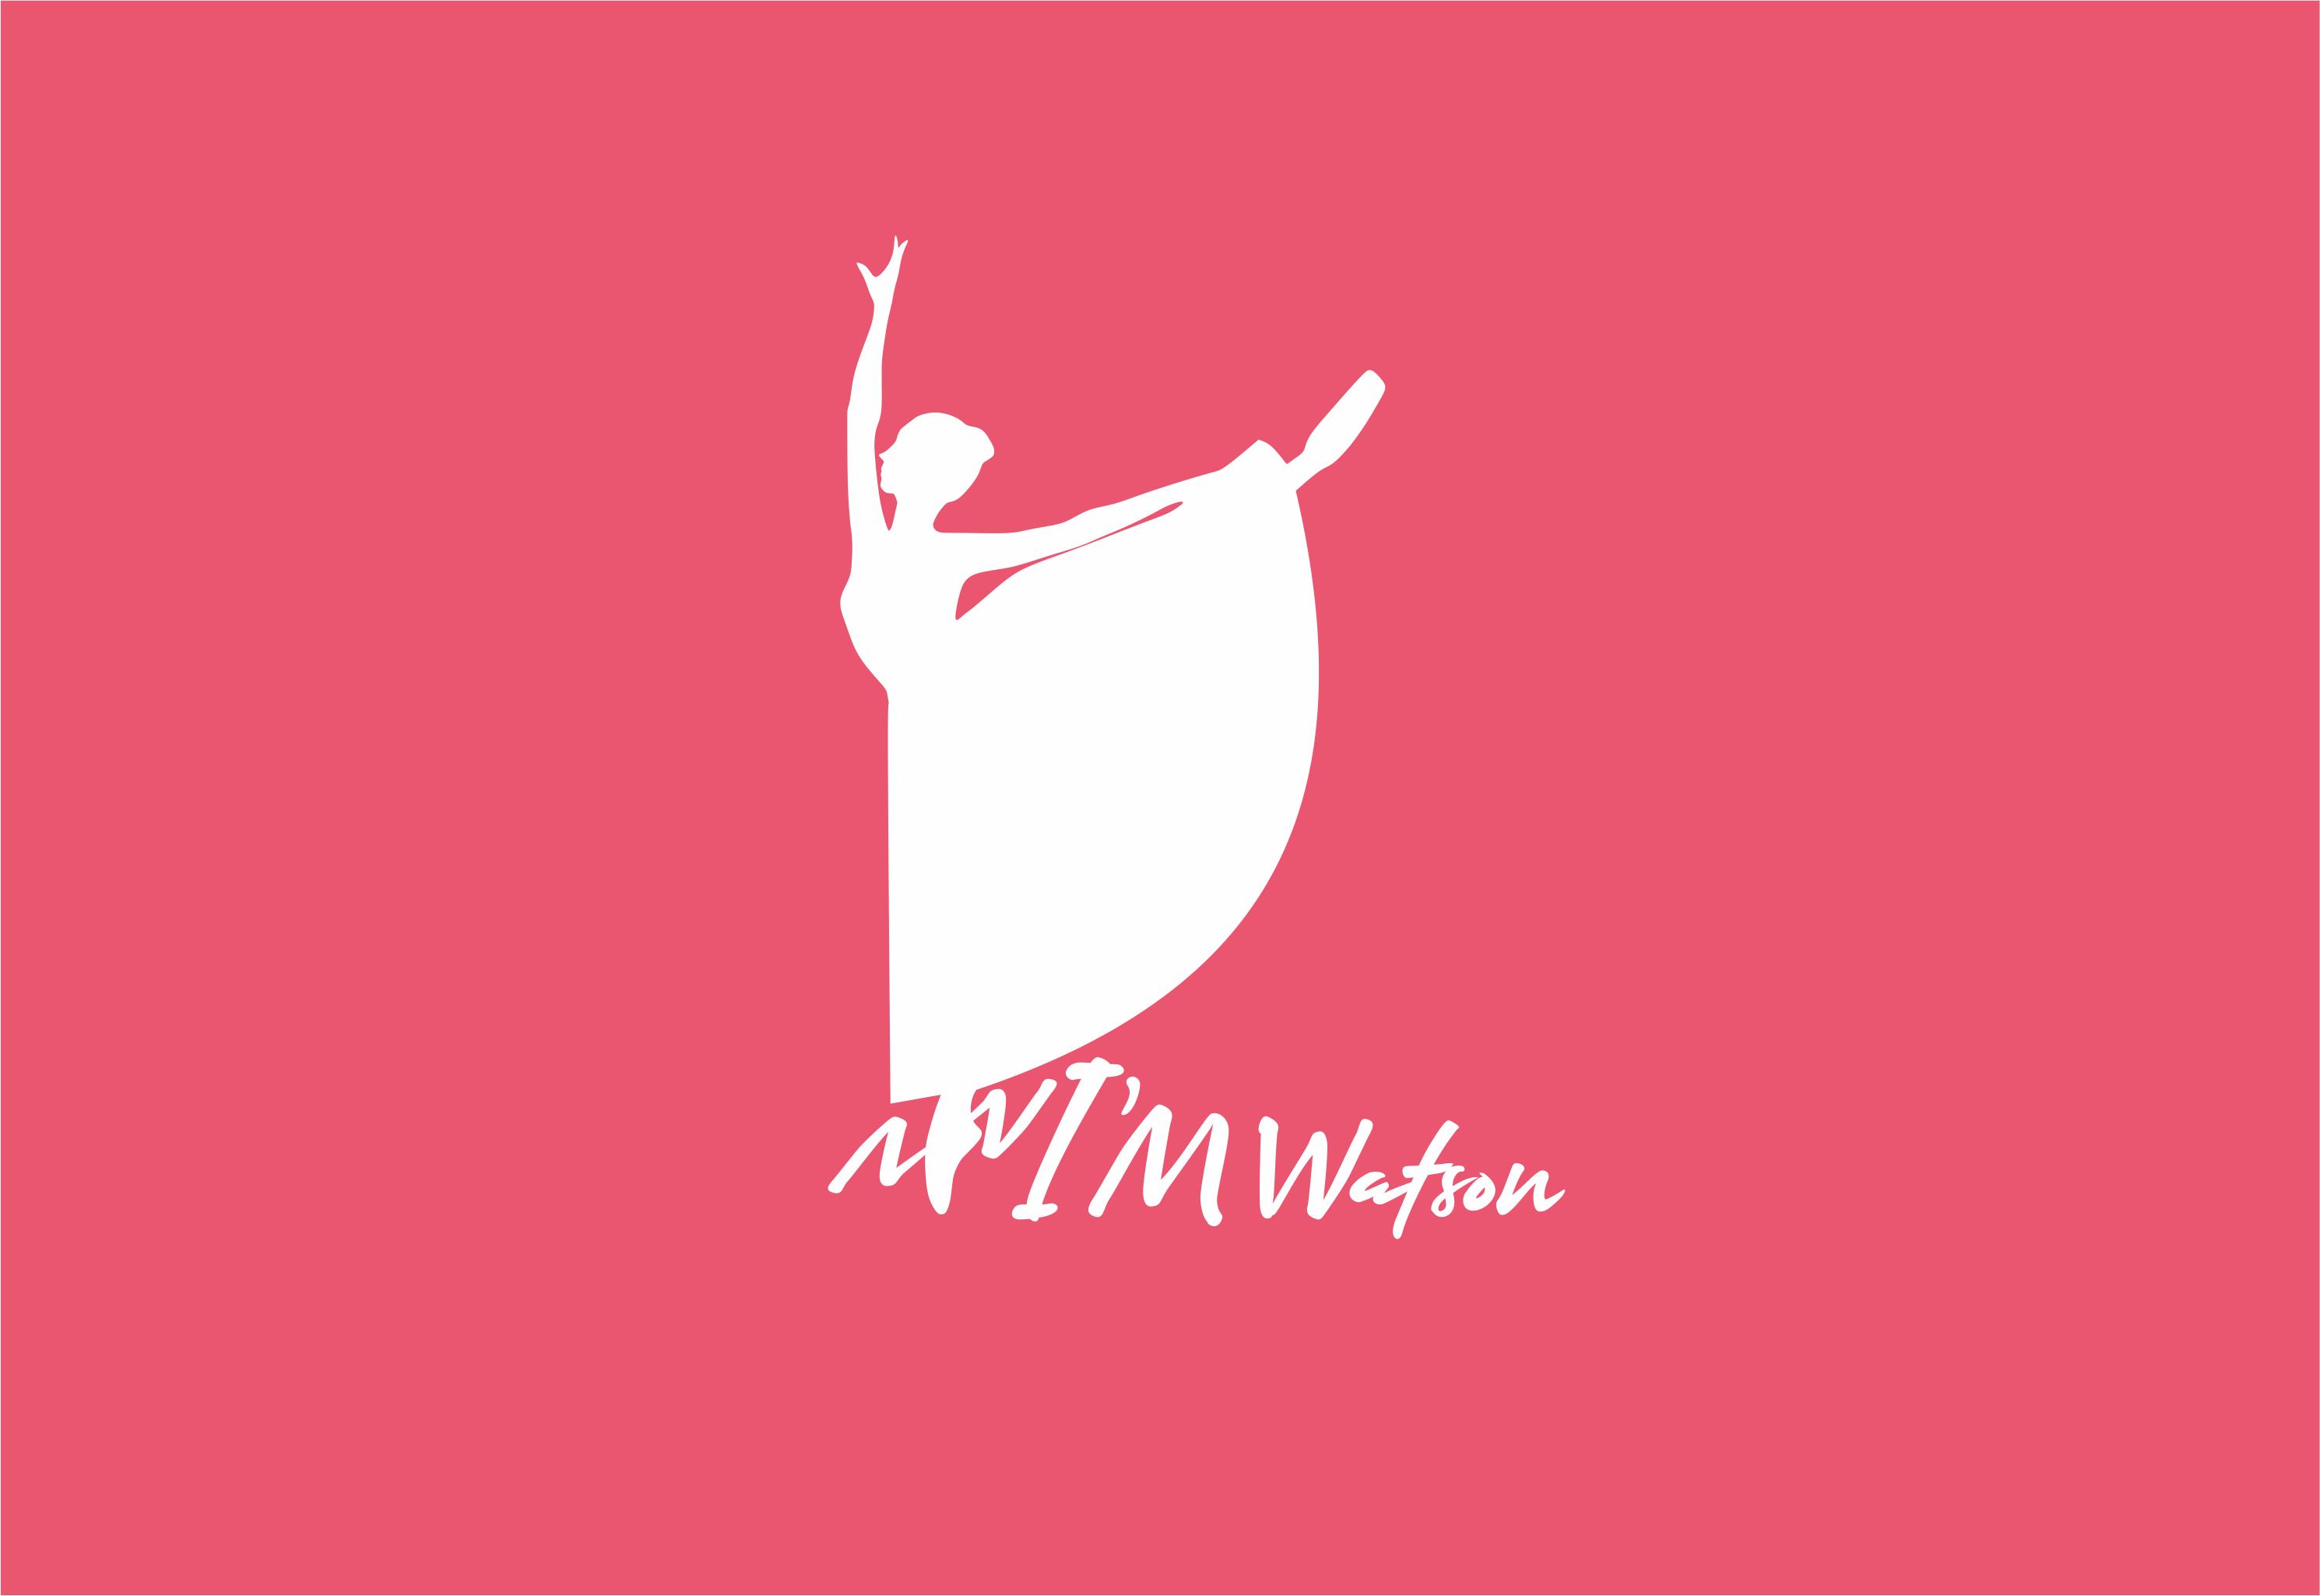 Разработать логотип для балетного бренда фото f_2295bbf7eeb46714.png